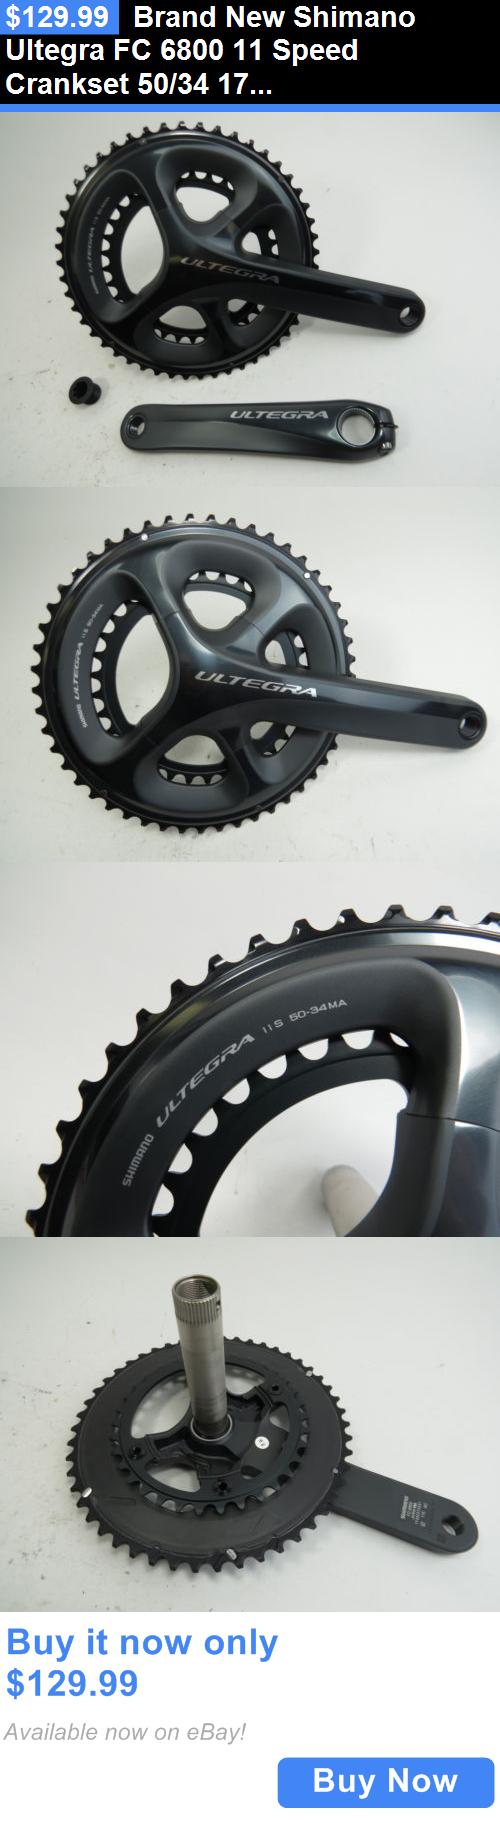 Bicycle Parts Brand New Shimano Ultegra Fc 6800 11 Speed Crankset